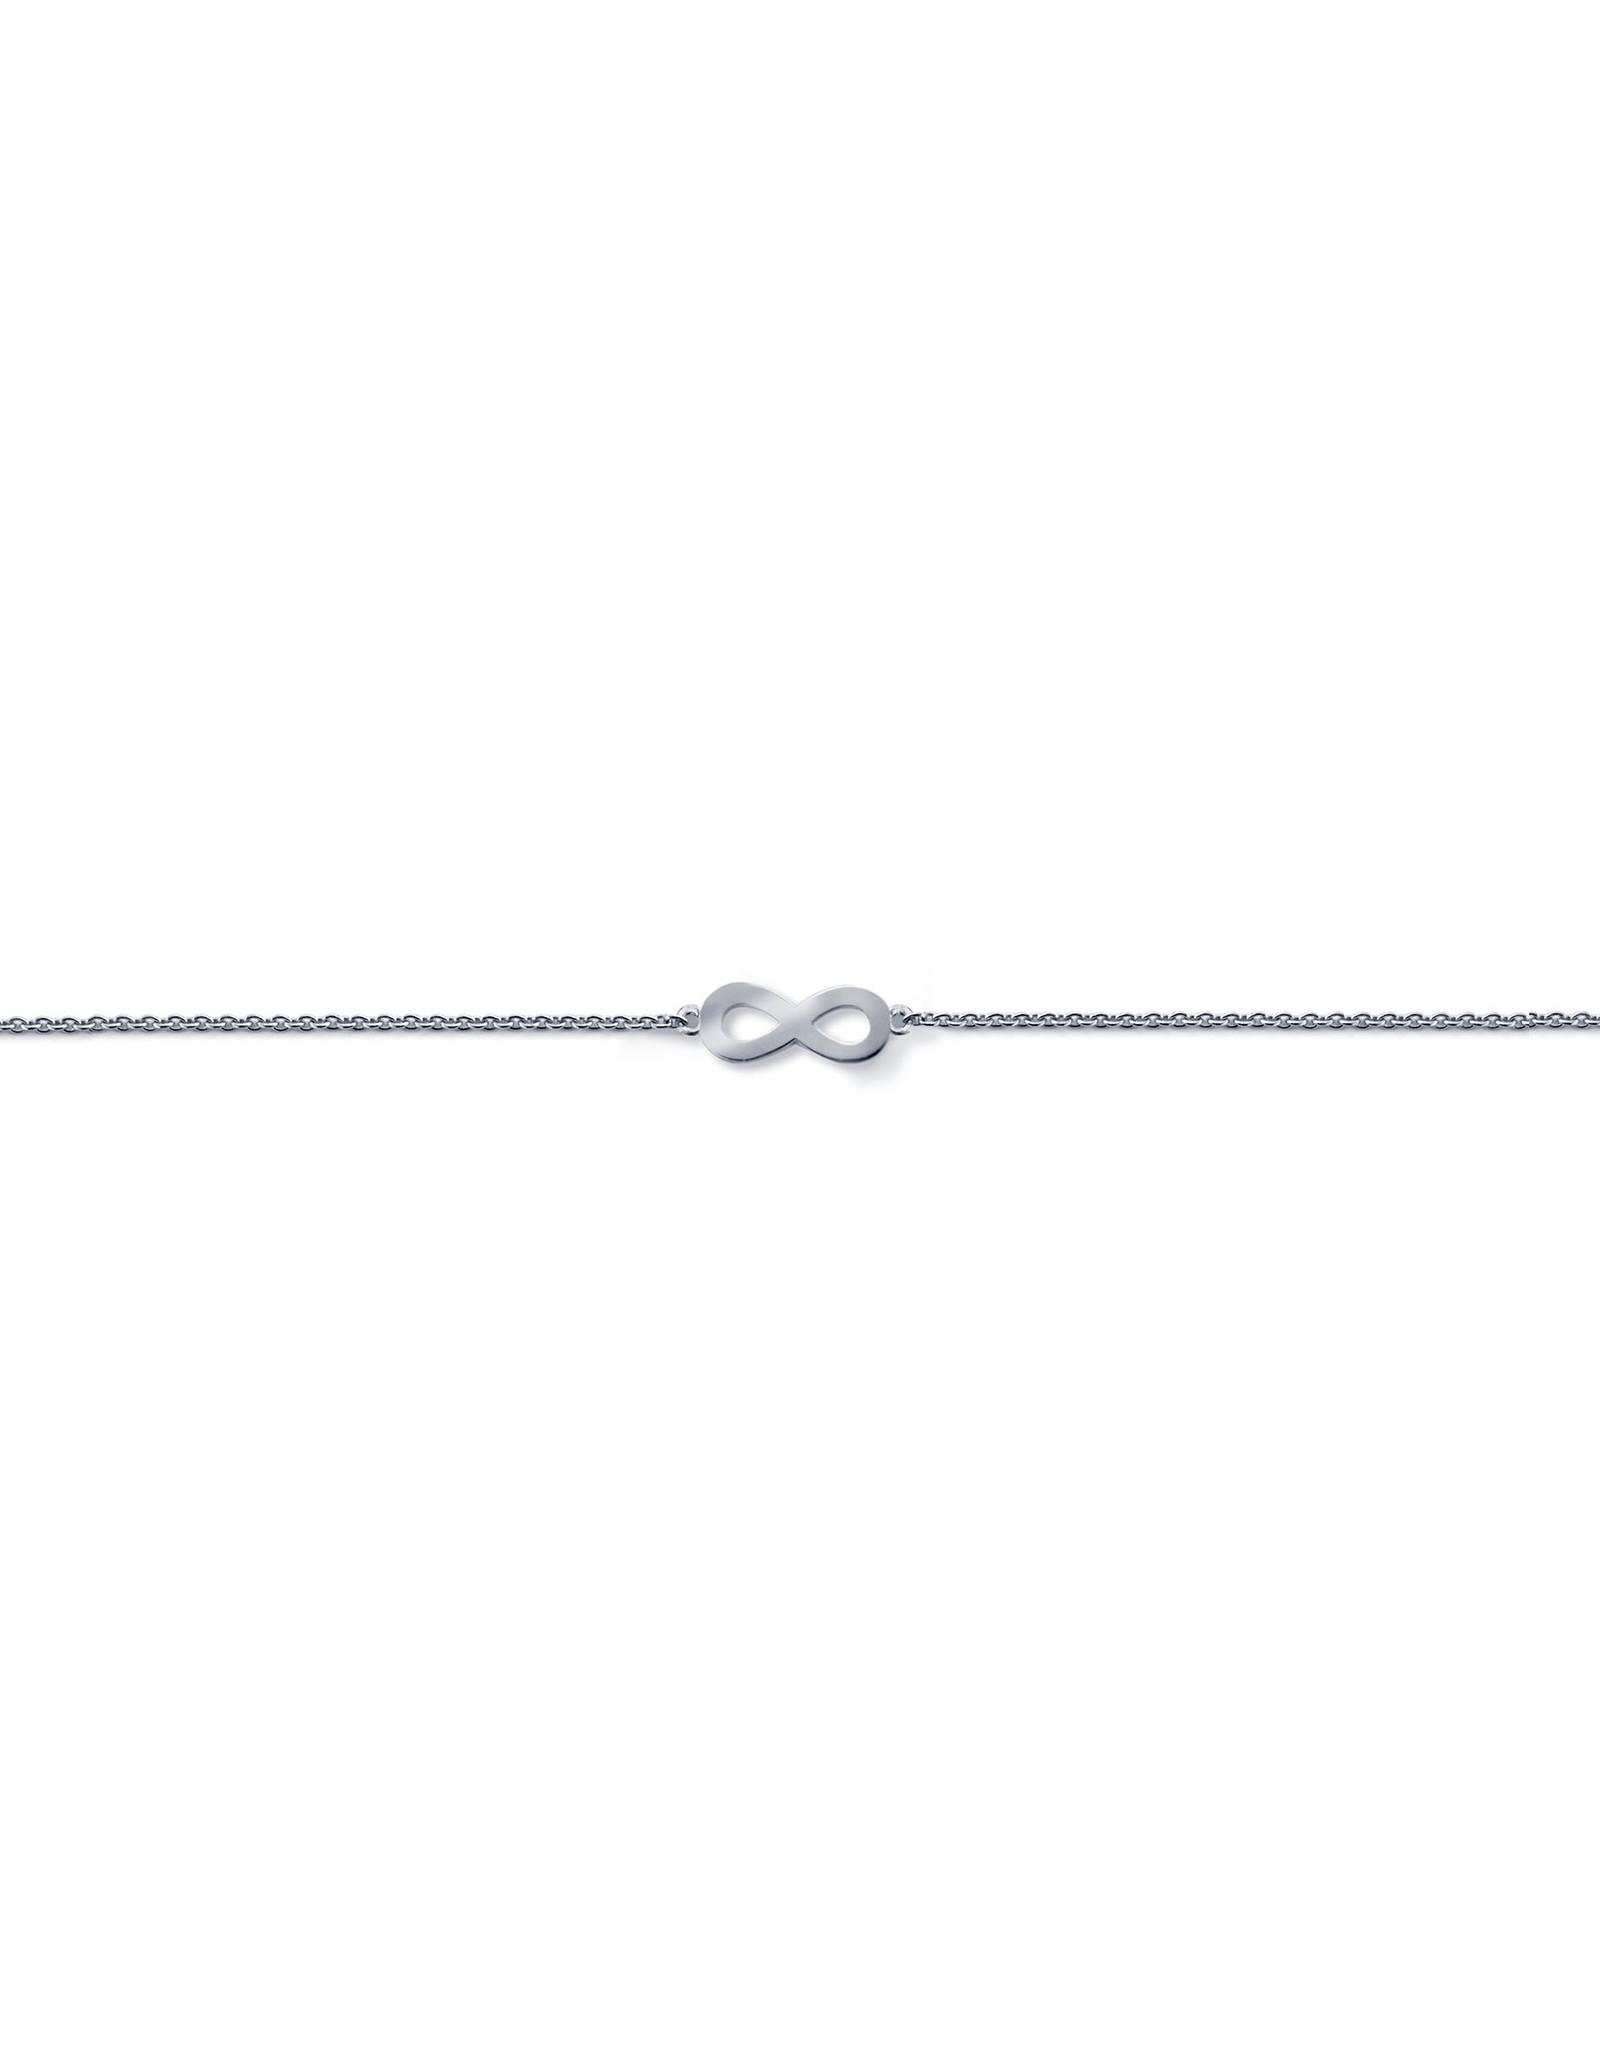 Miss Spring Armband Tiny Ones Wit Goud 18kt MSA149WG Infinity